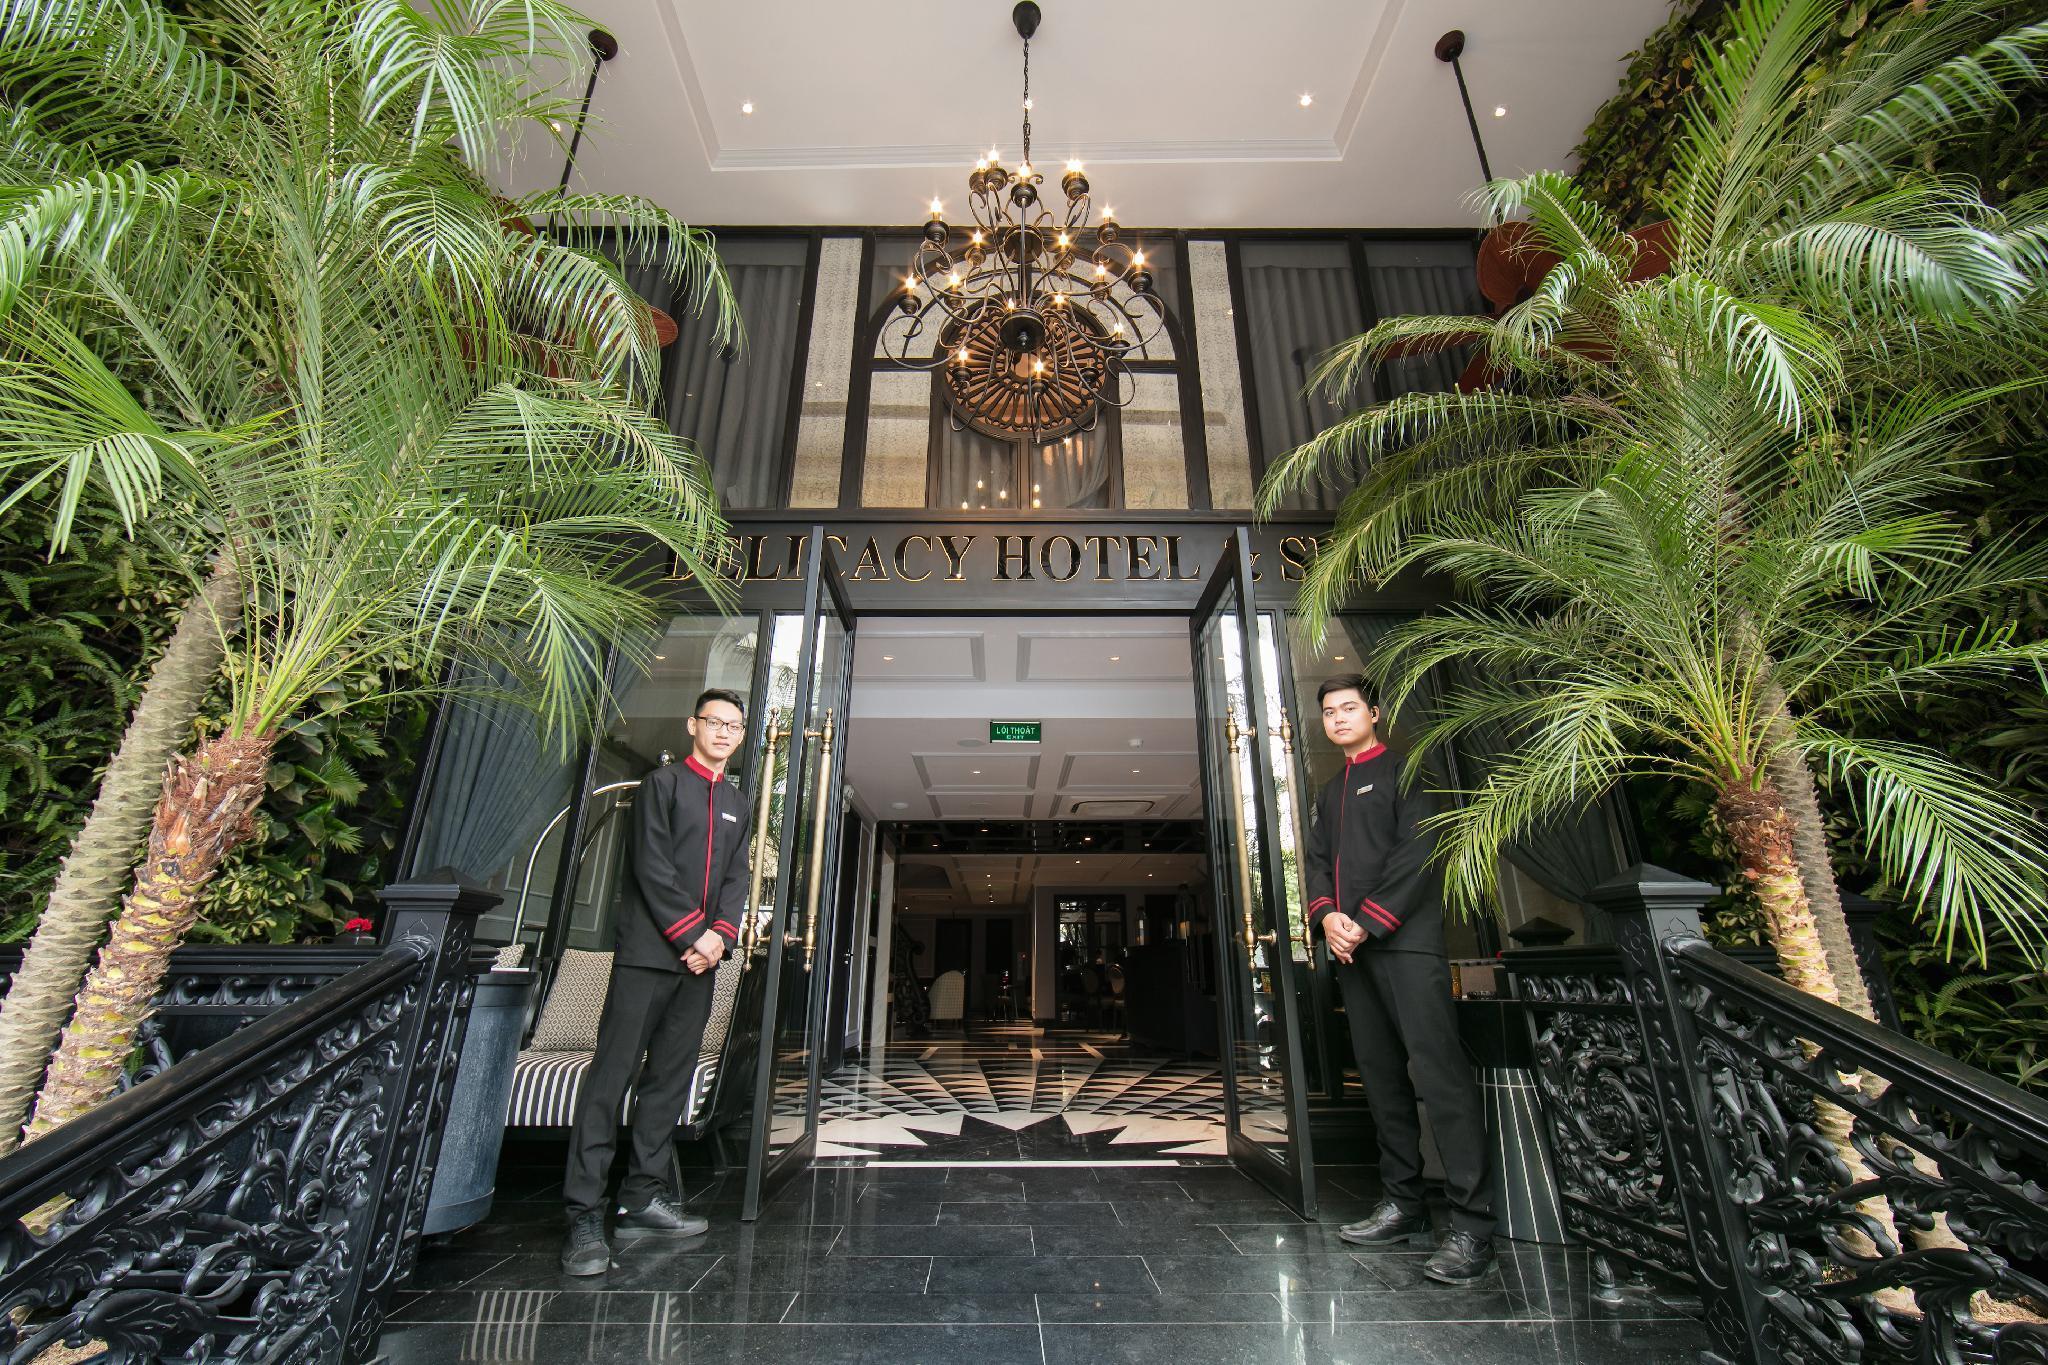 Delicacy Hotel And Spa